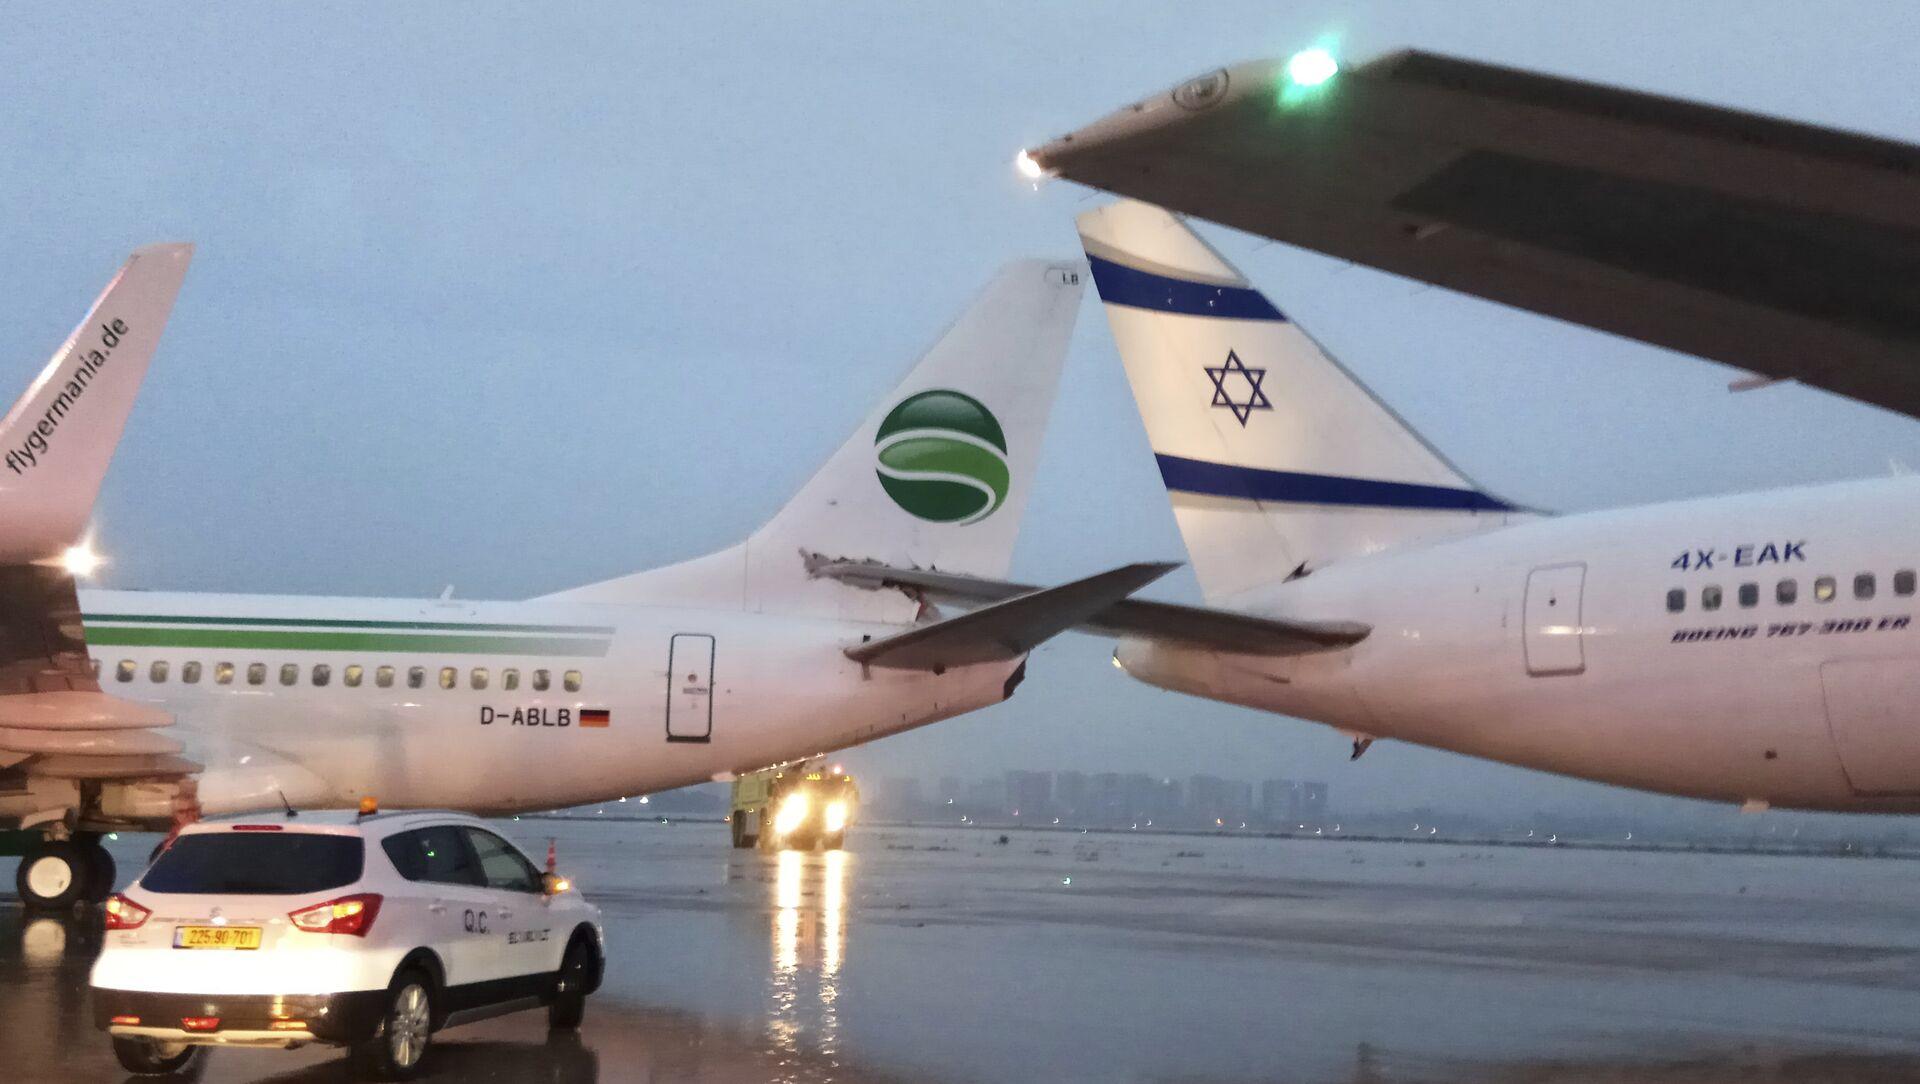 Airplanes are seen at the Ben Gurion airport near Tel Aviv, Israel, Wednesday, March 28, 2018 - Sputnik International, 1920, 25.07.2021